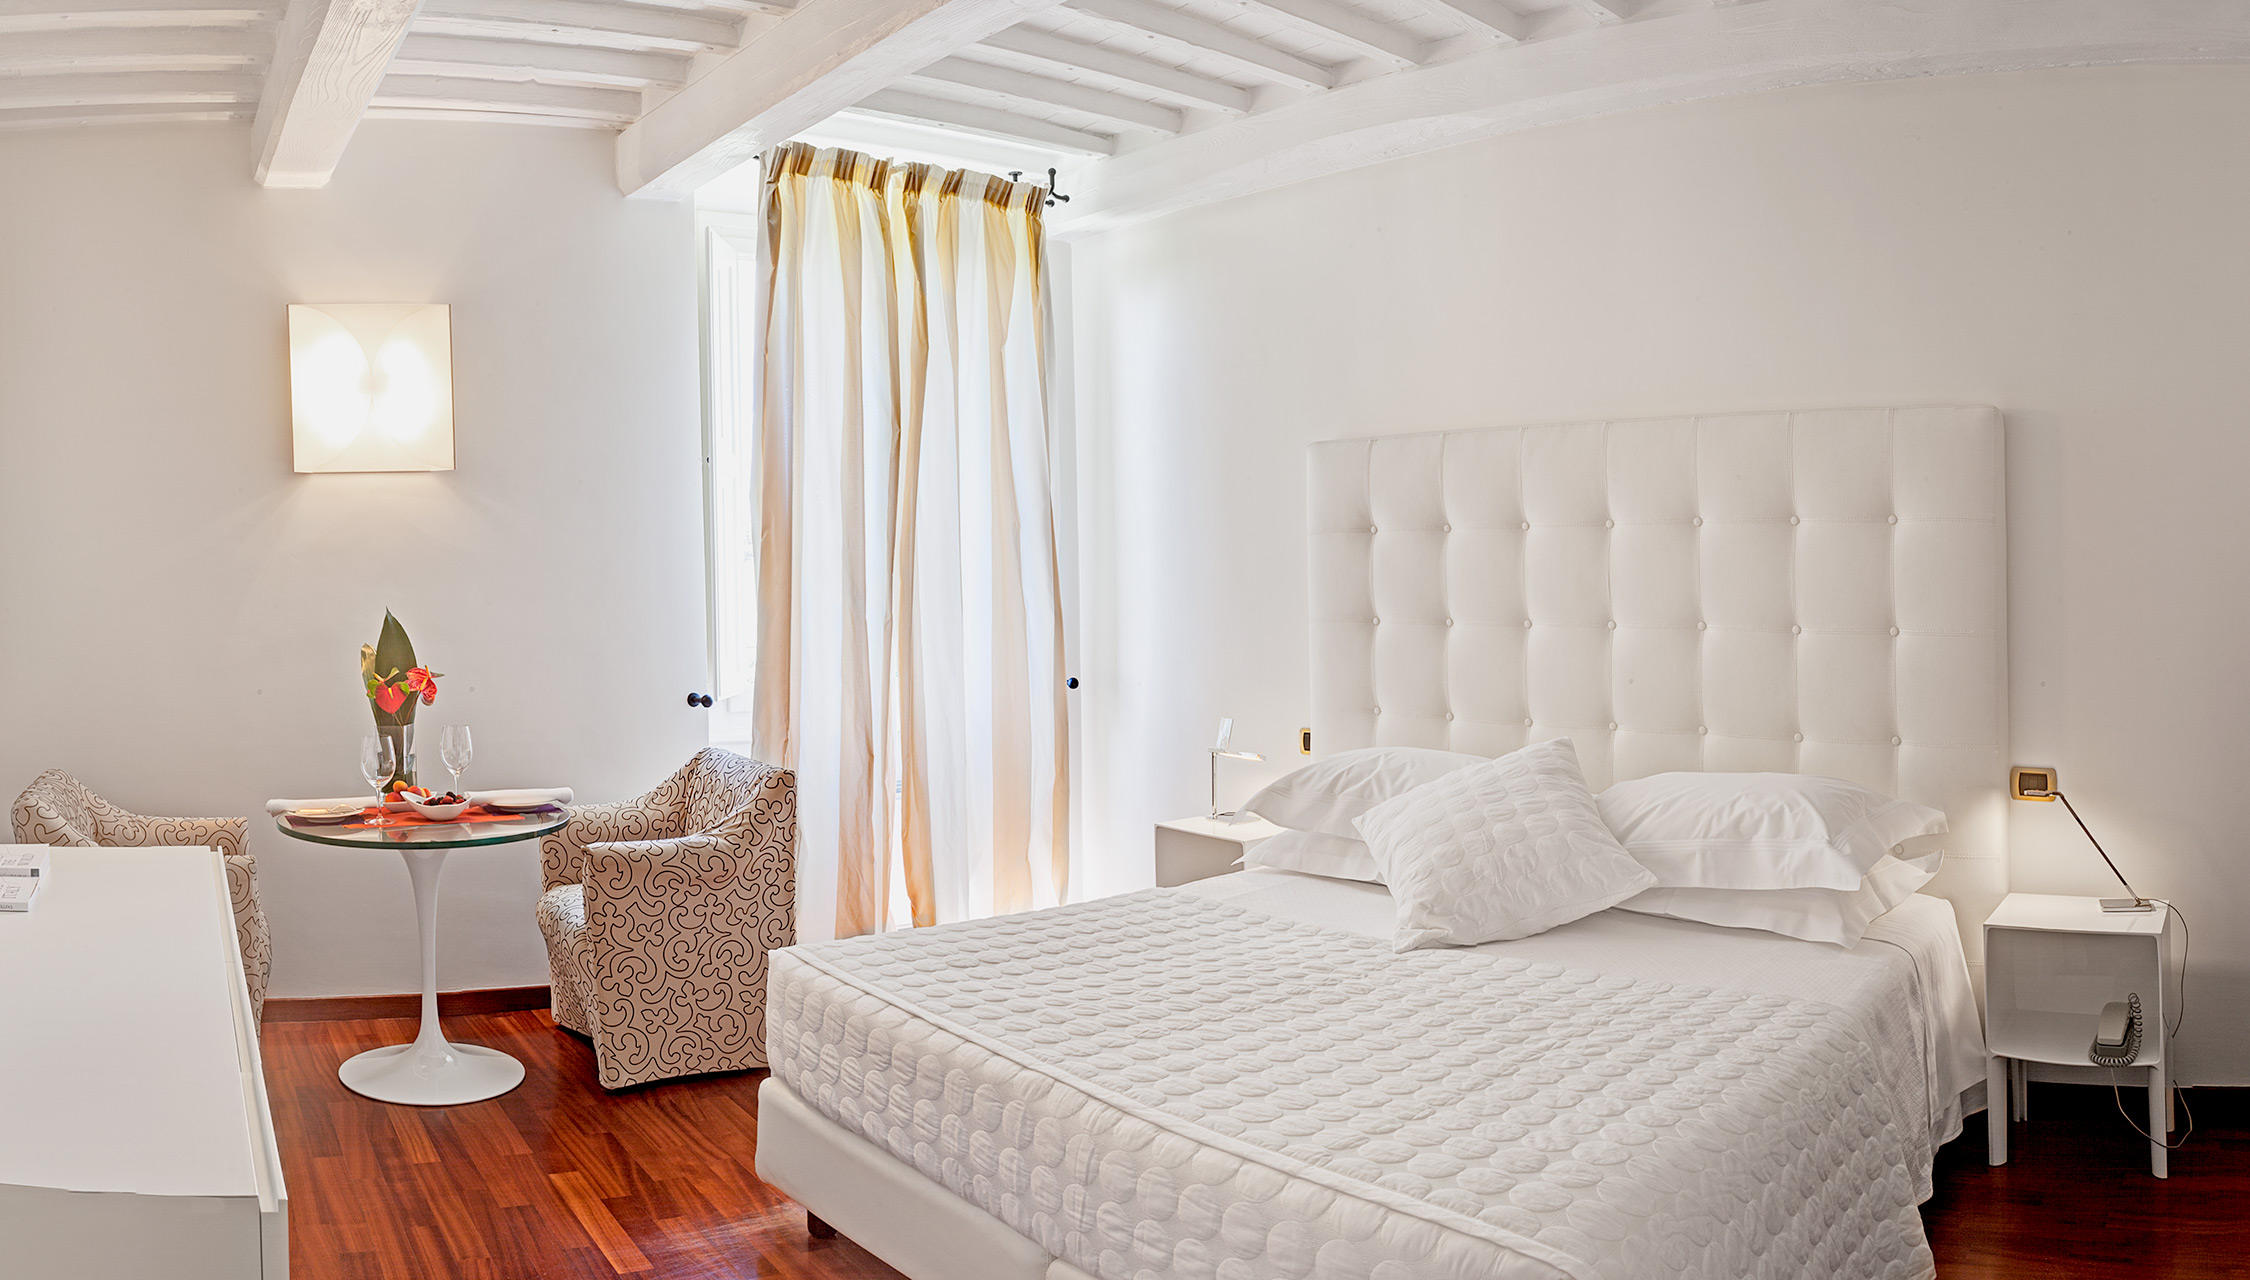 Dormir chez Arnolfo